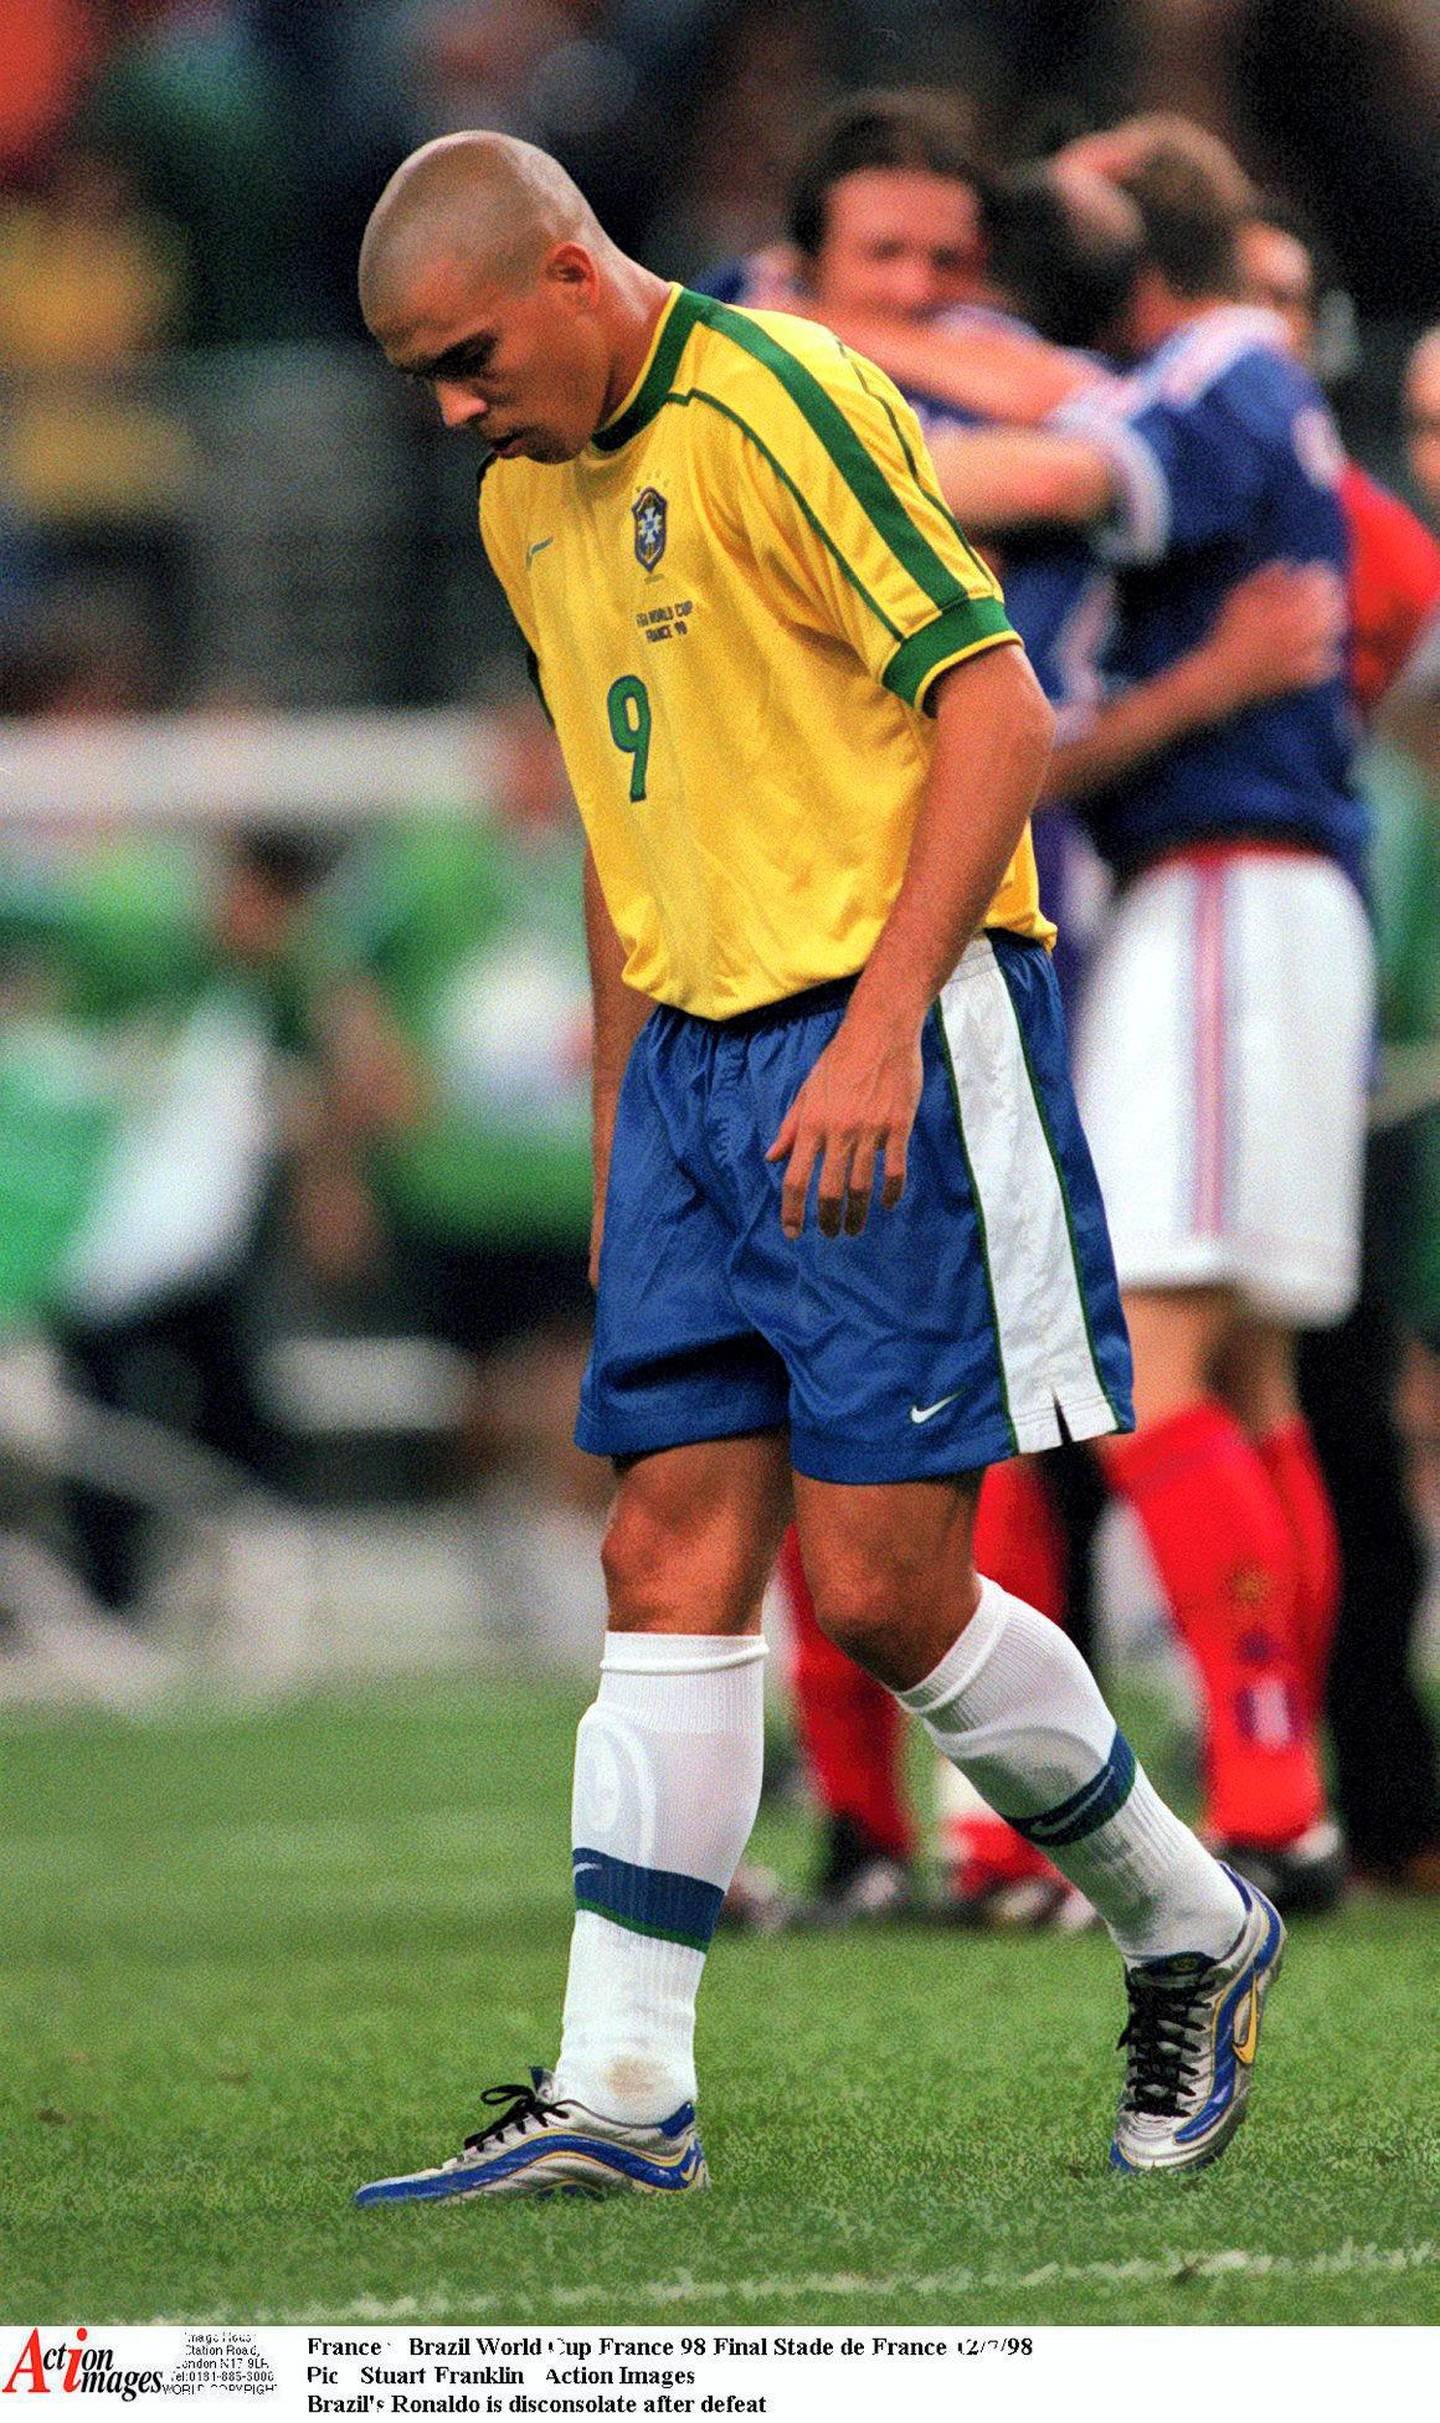 Football - 1998 FIFA World Cup - Final - France v Brazil - Stade de France, Saint Denis - 12/7/98  Pic : Stuart Franklin / Action Images  Brazil's Ronaldo is disconsolate after defeat - MT1ACI1686552